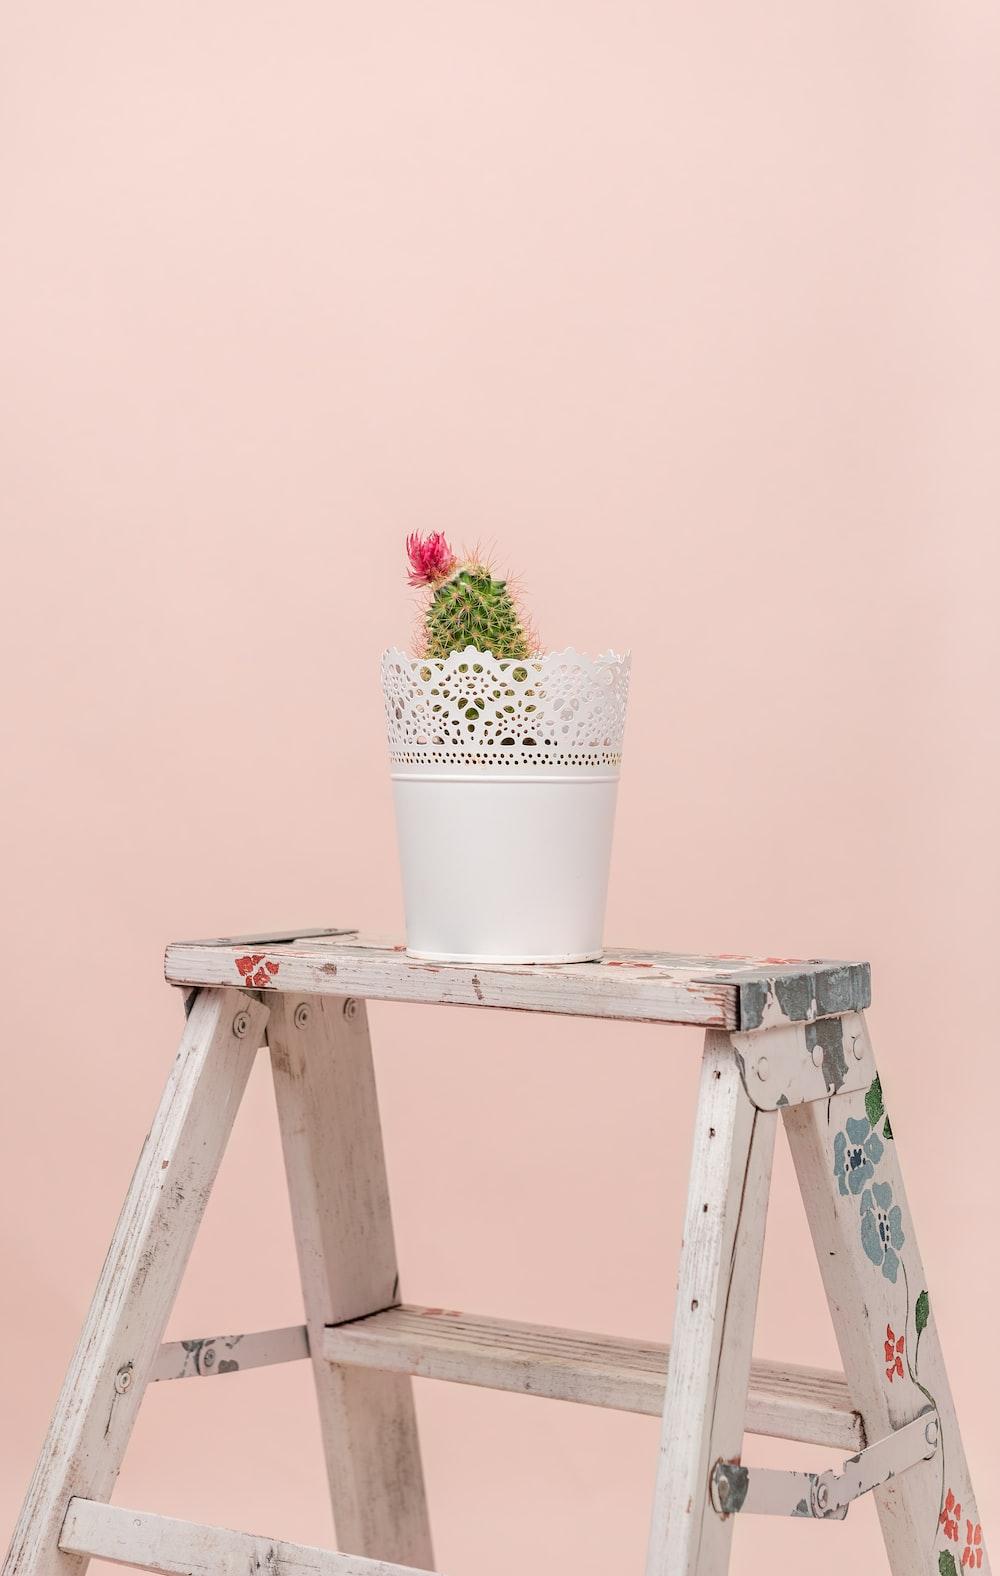 white ceramic flower pot on brown wooden chair